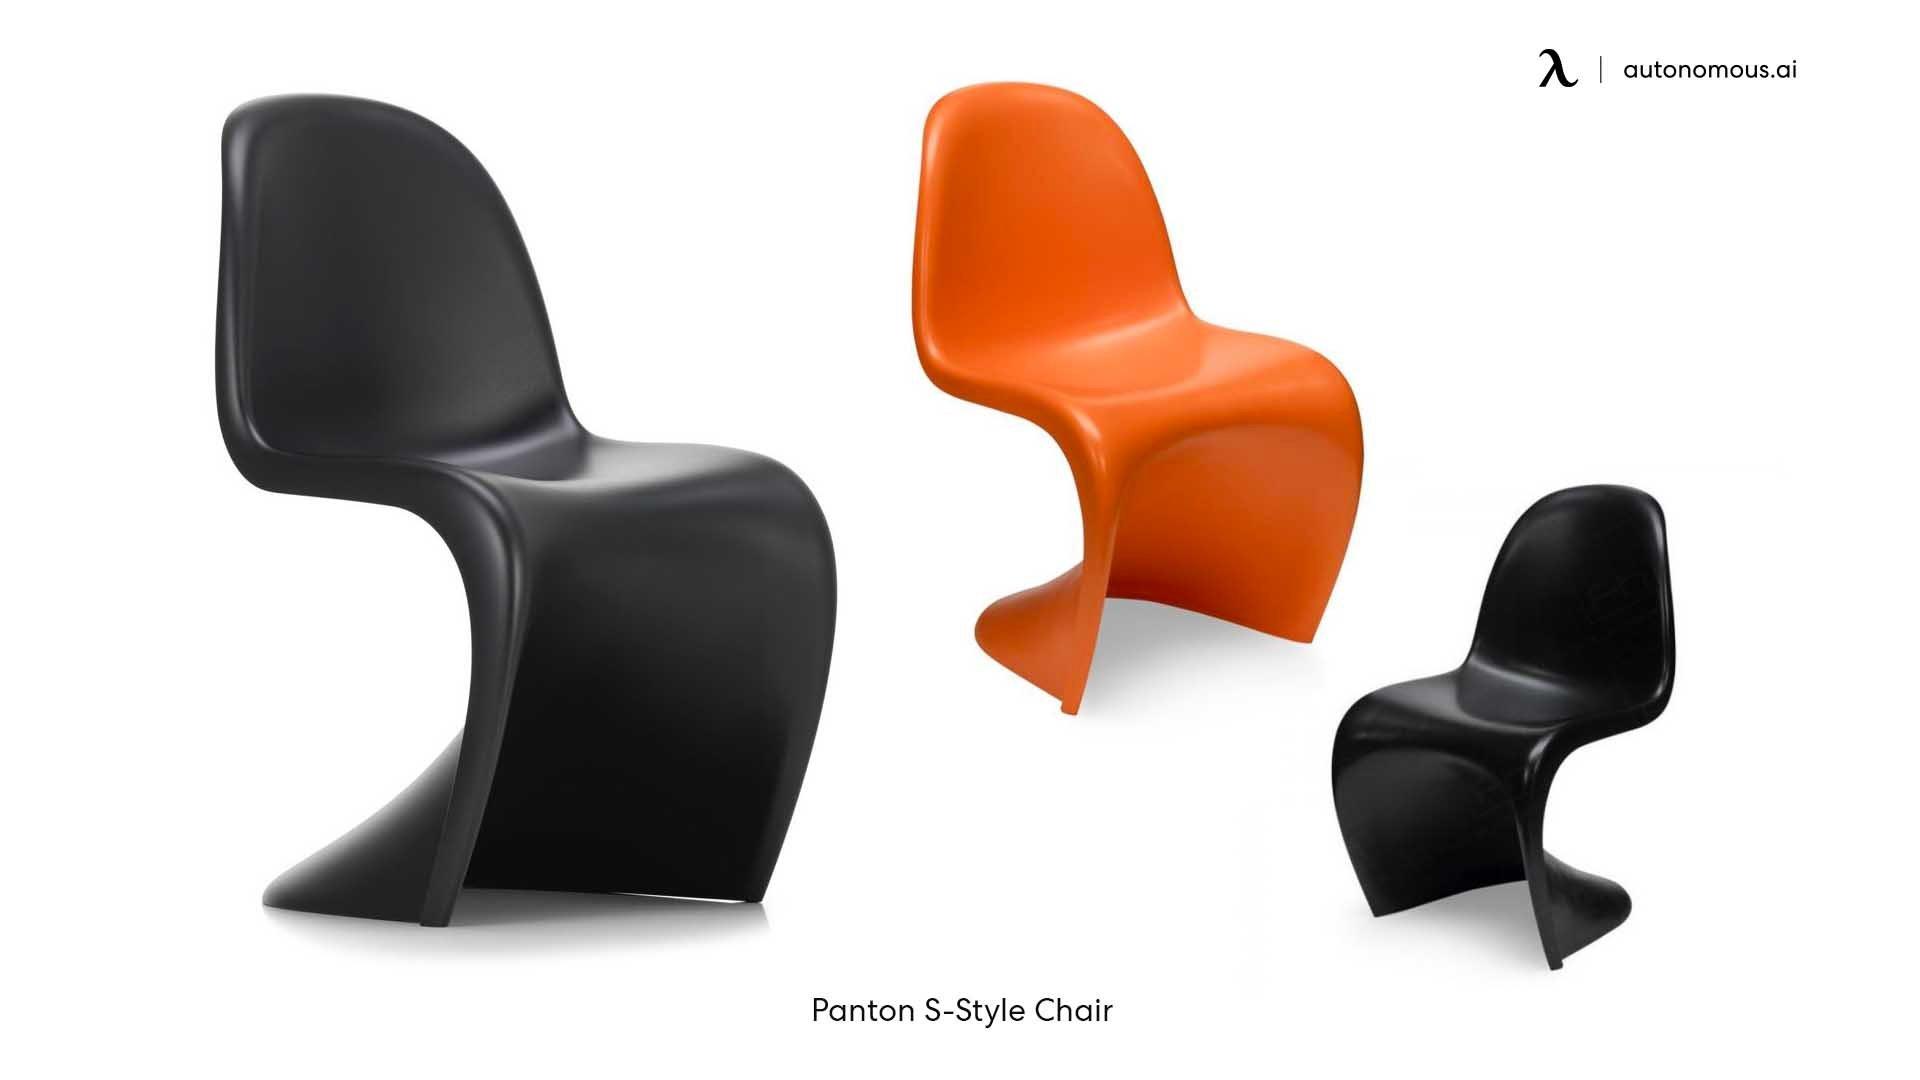 Pantoon S-Style Chair